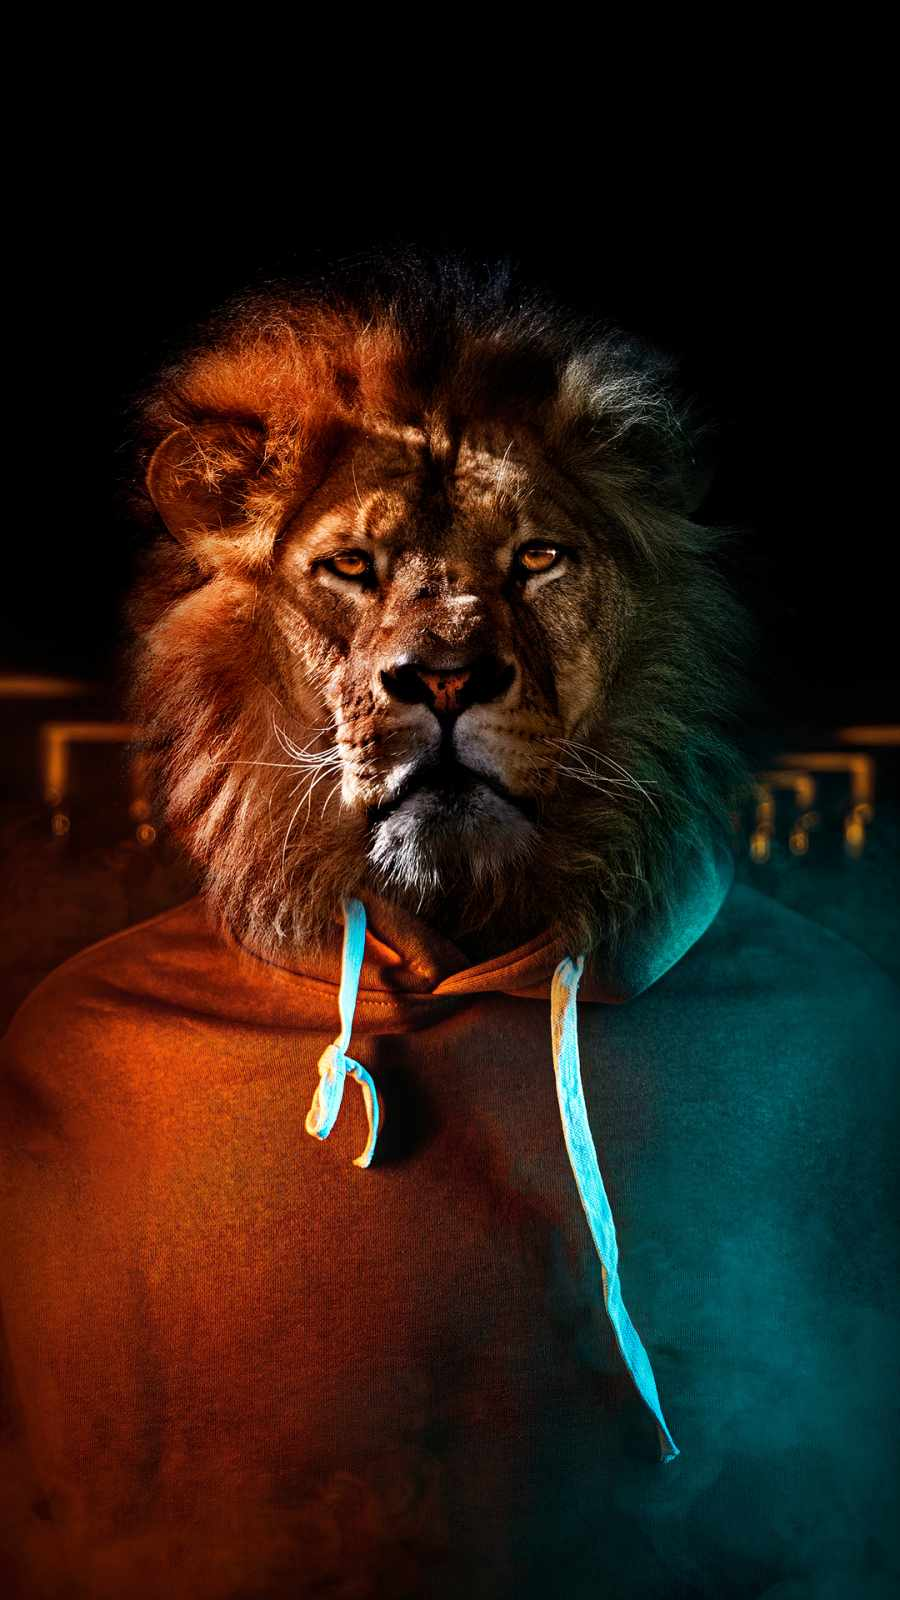 Lion Face Man iPhone Wallpaper